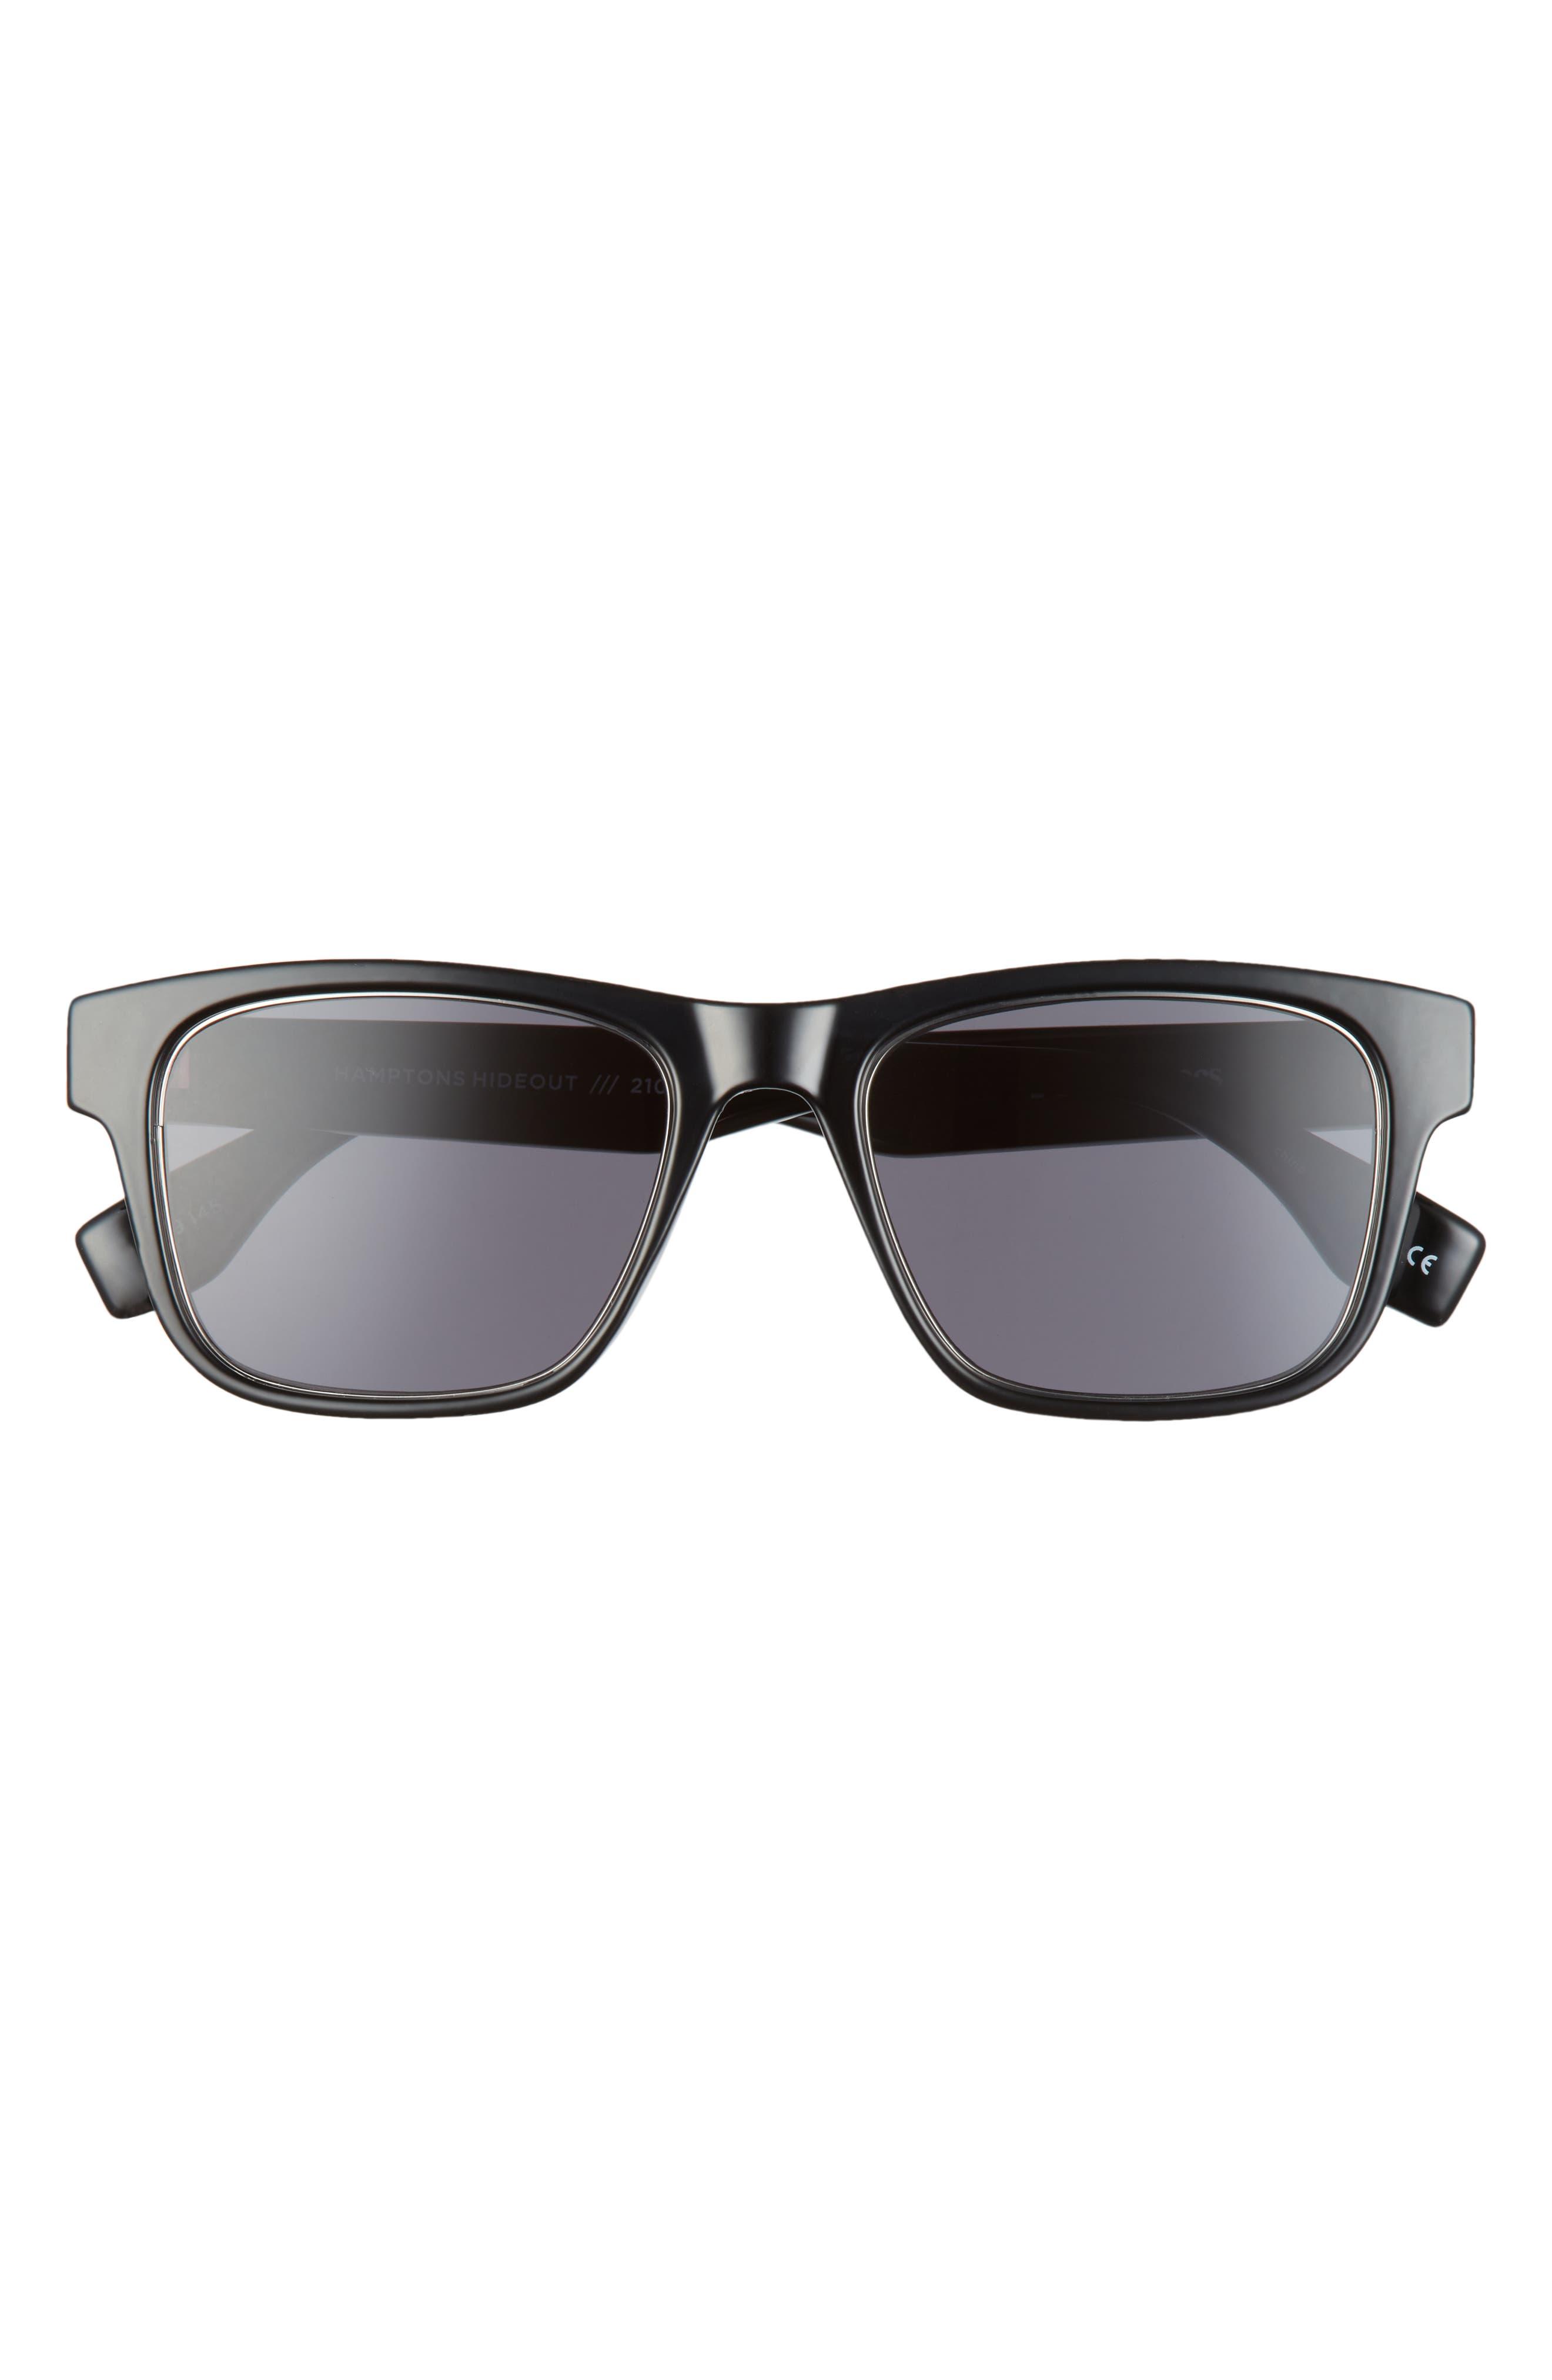 Hamptons Hideout 53mm Square Sunglasses